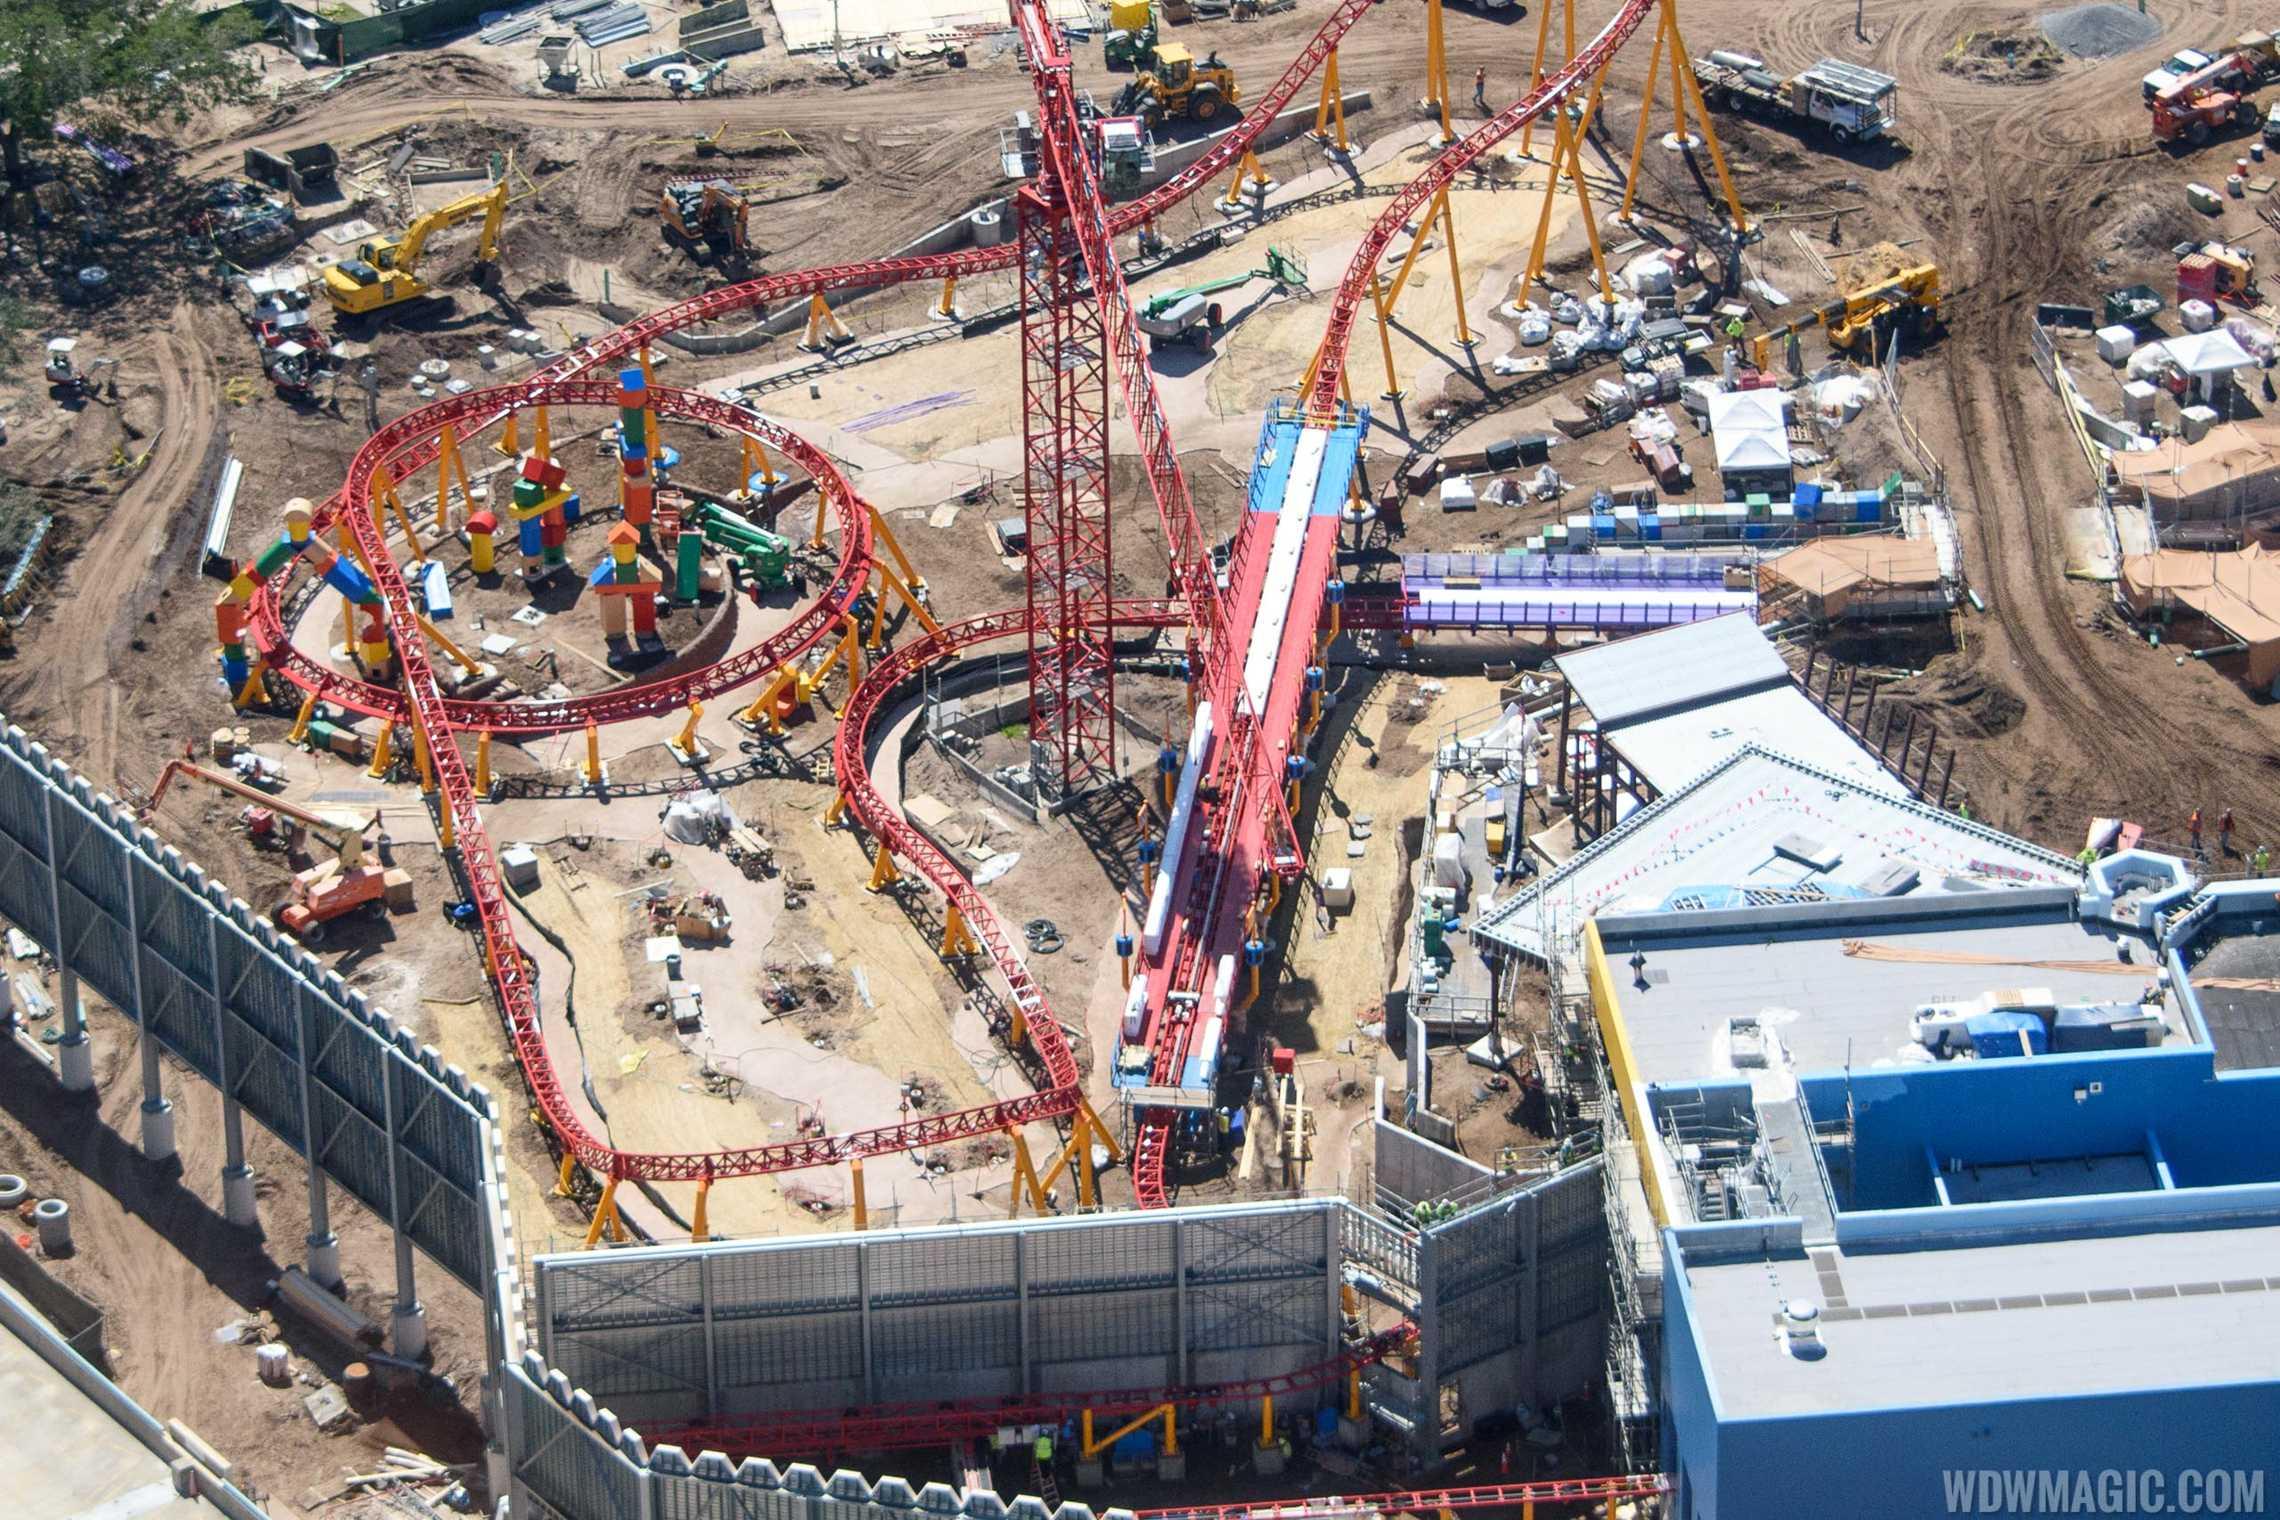 Toy Story Land - Slinky Dog Coaster under construction